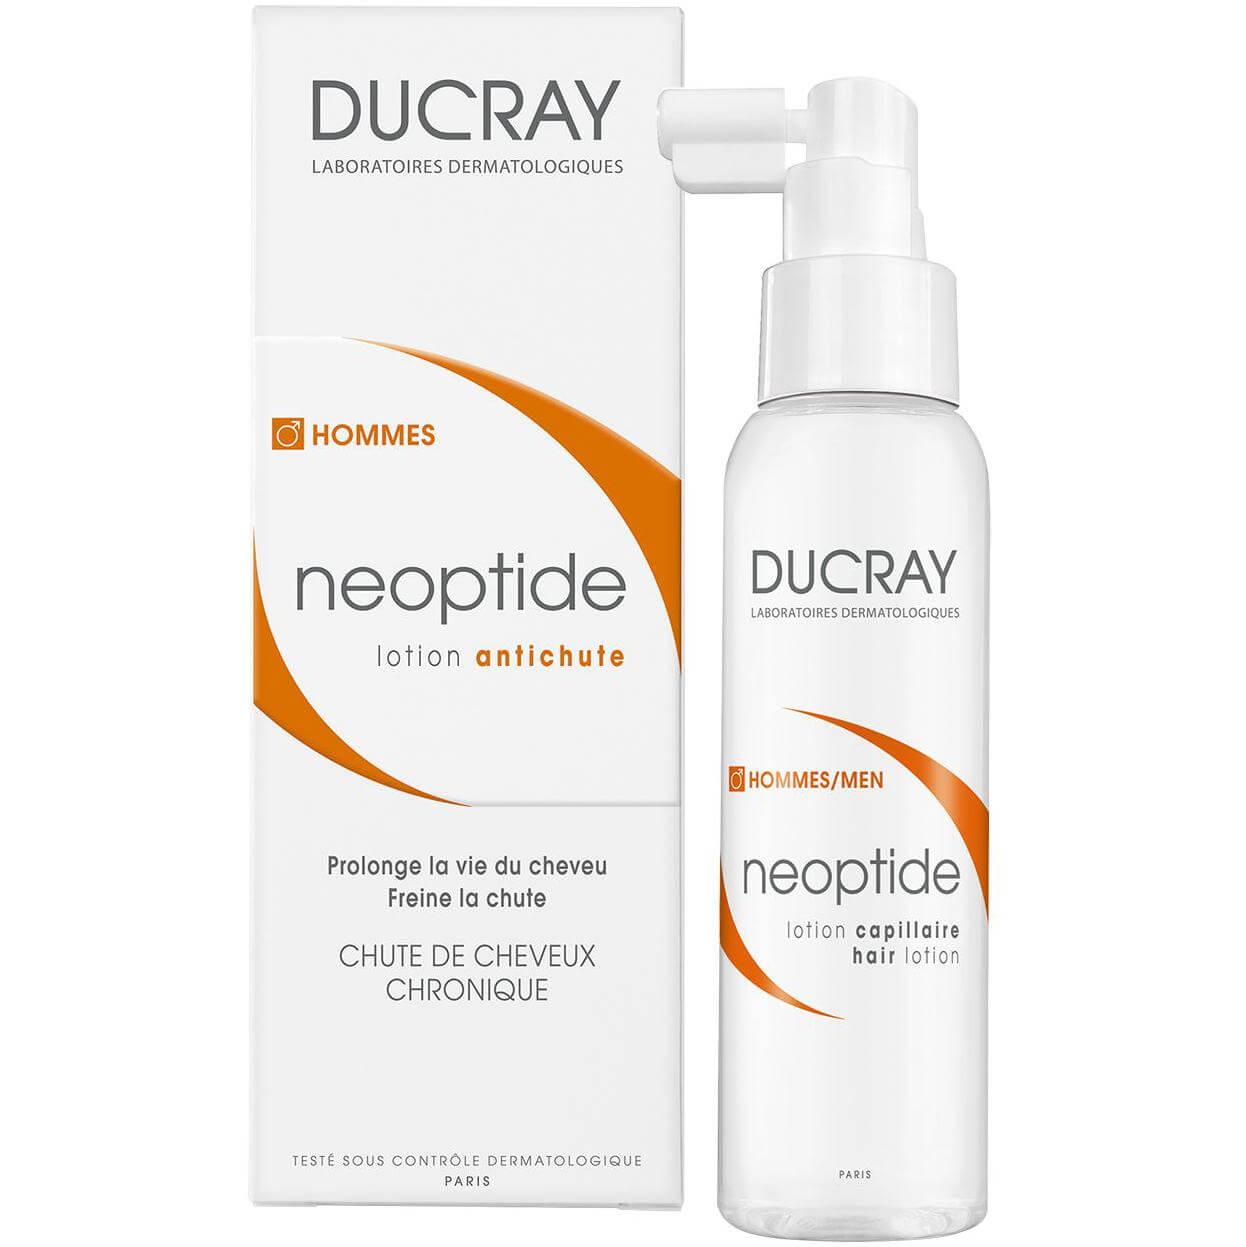 Ducray Neoptide Homme Ανδρική LotionΚατά Της Τριχόπτωσης 100ml 10602